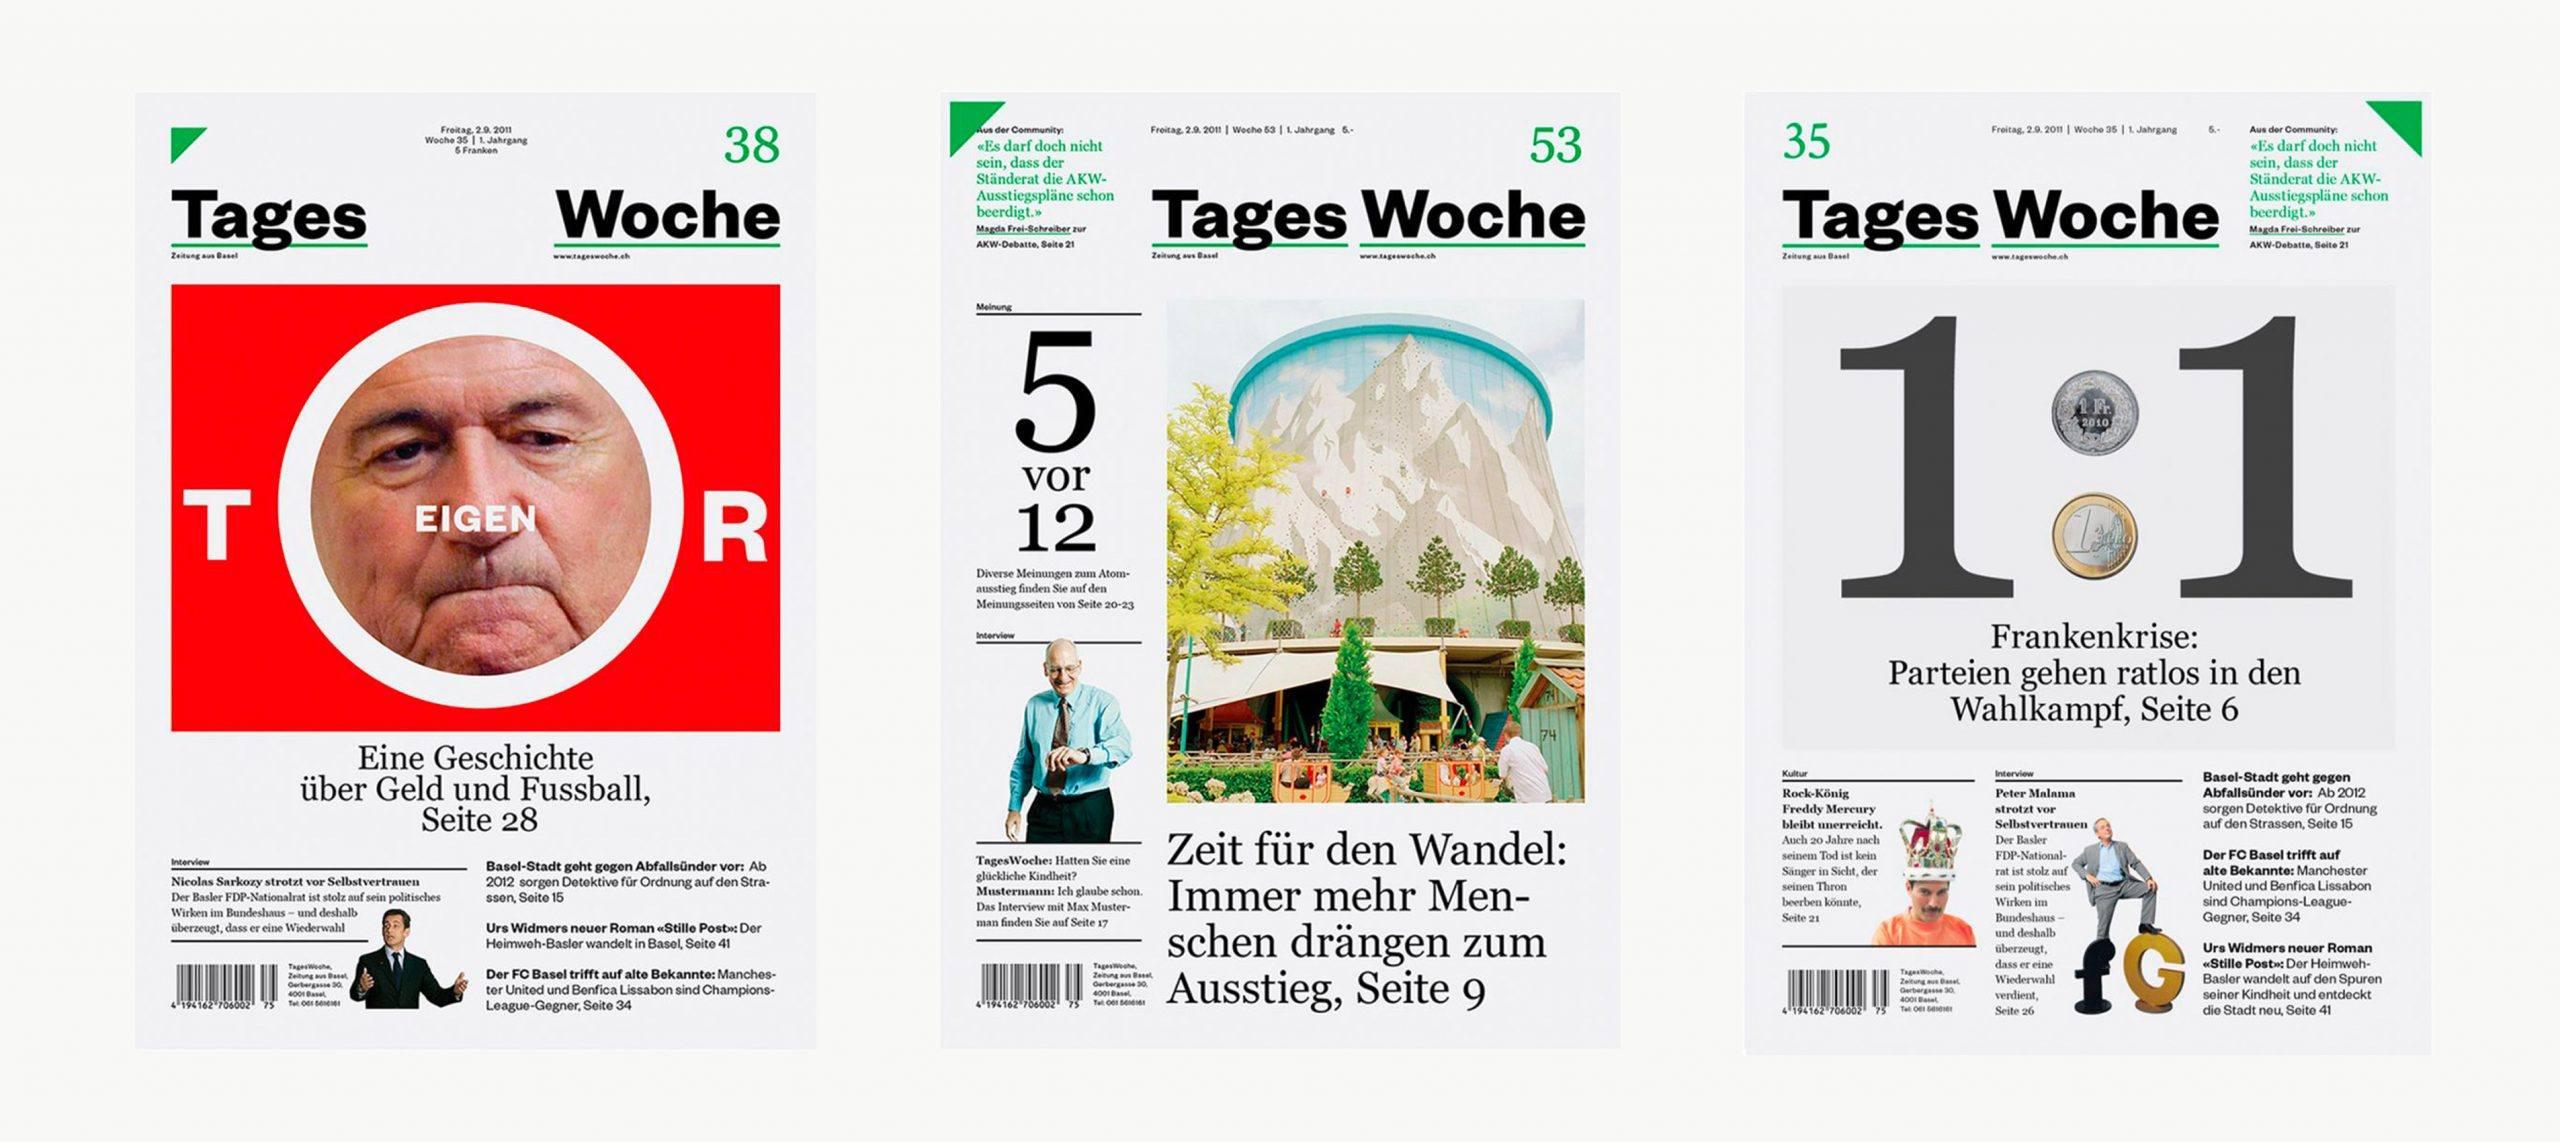 Studio Last - Tageswoche – Newspaper